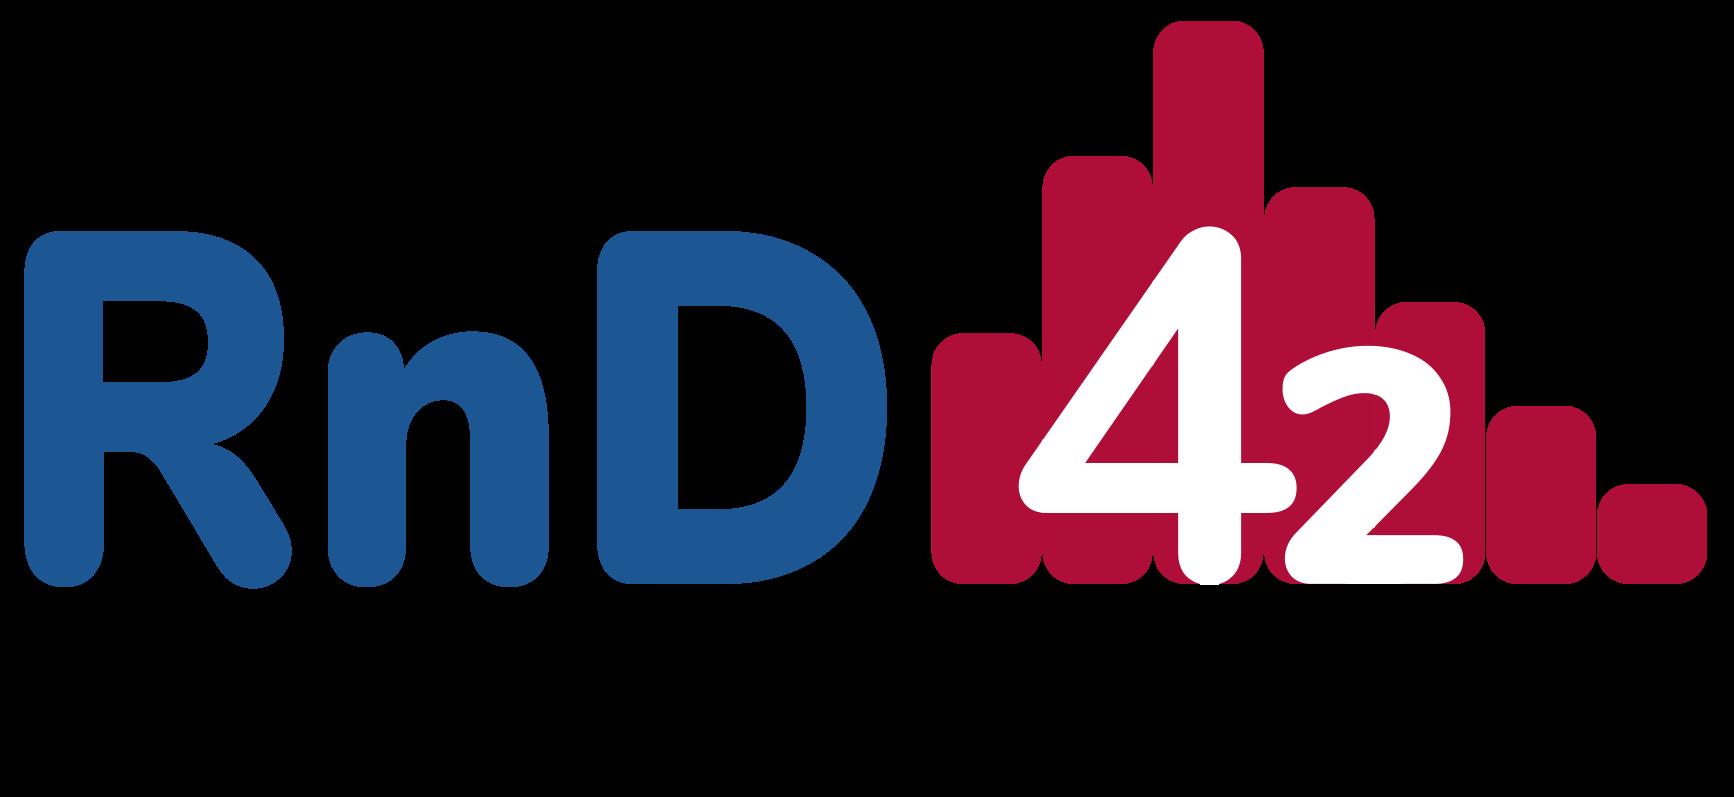 RnD-42